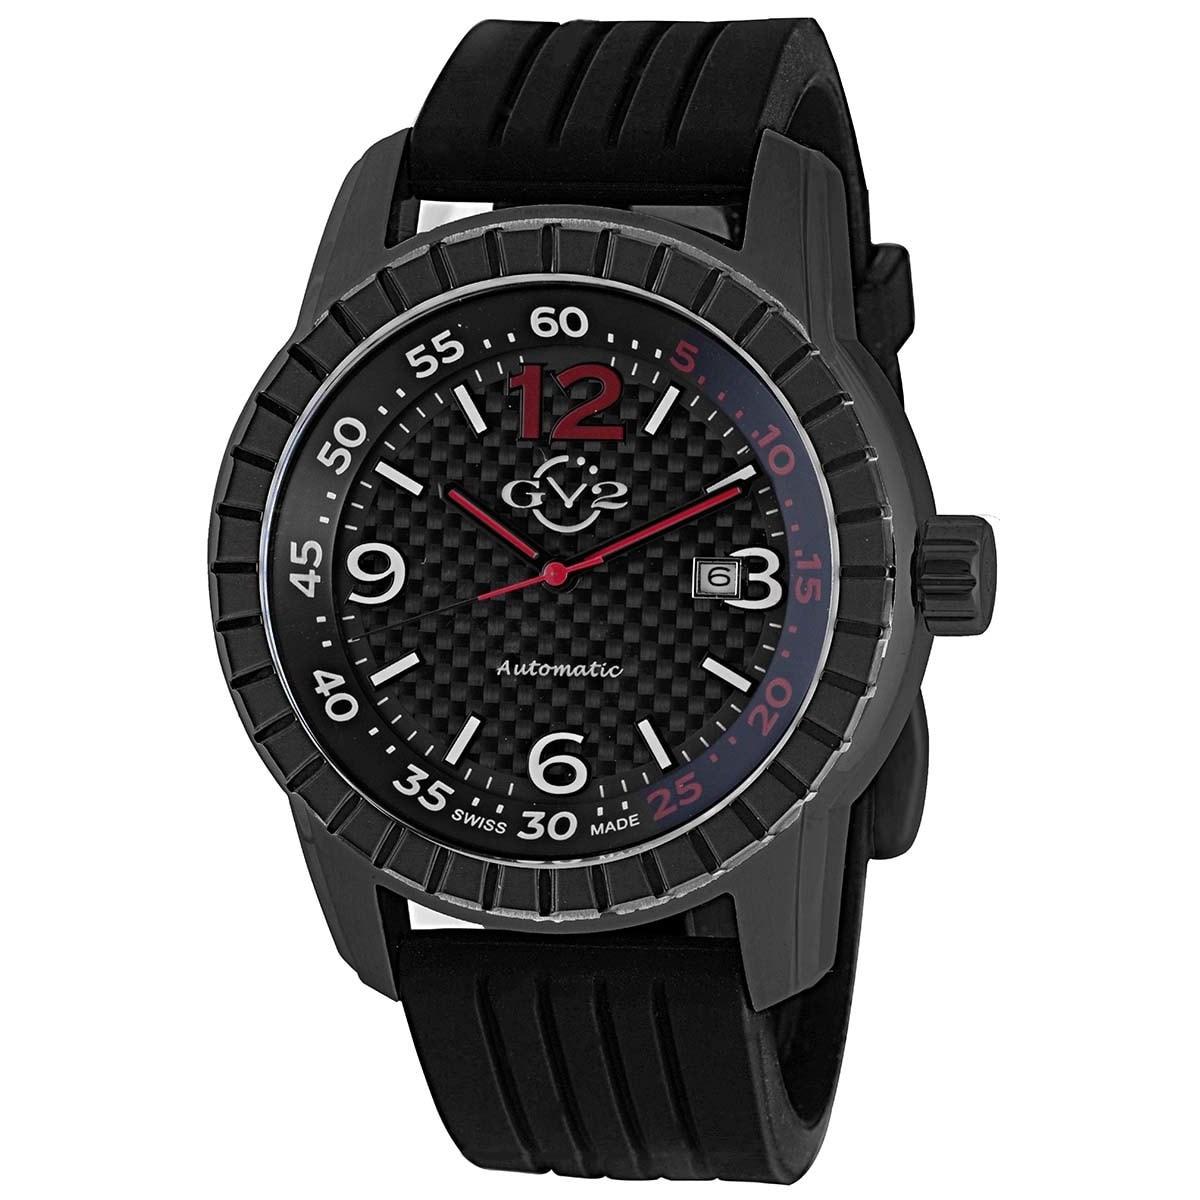 Gevril GV2 Men's Automatic Black Rubber Strap Watch (GV2 ...